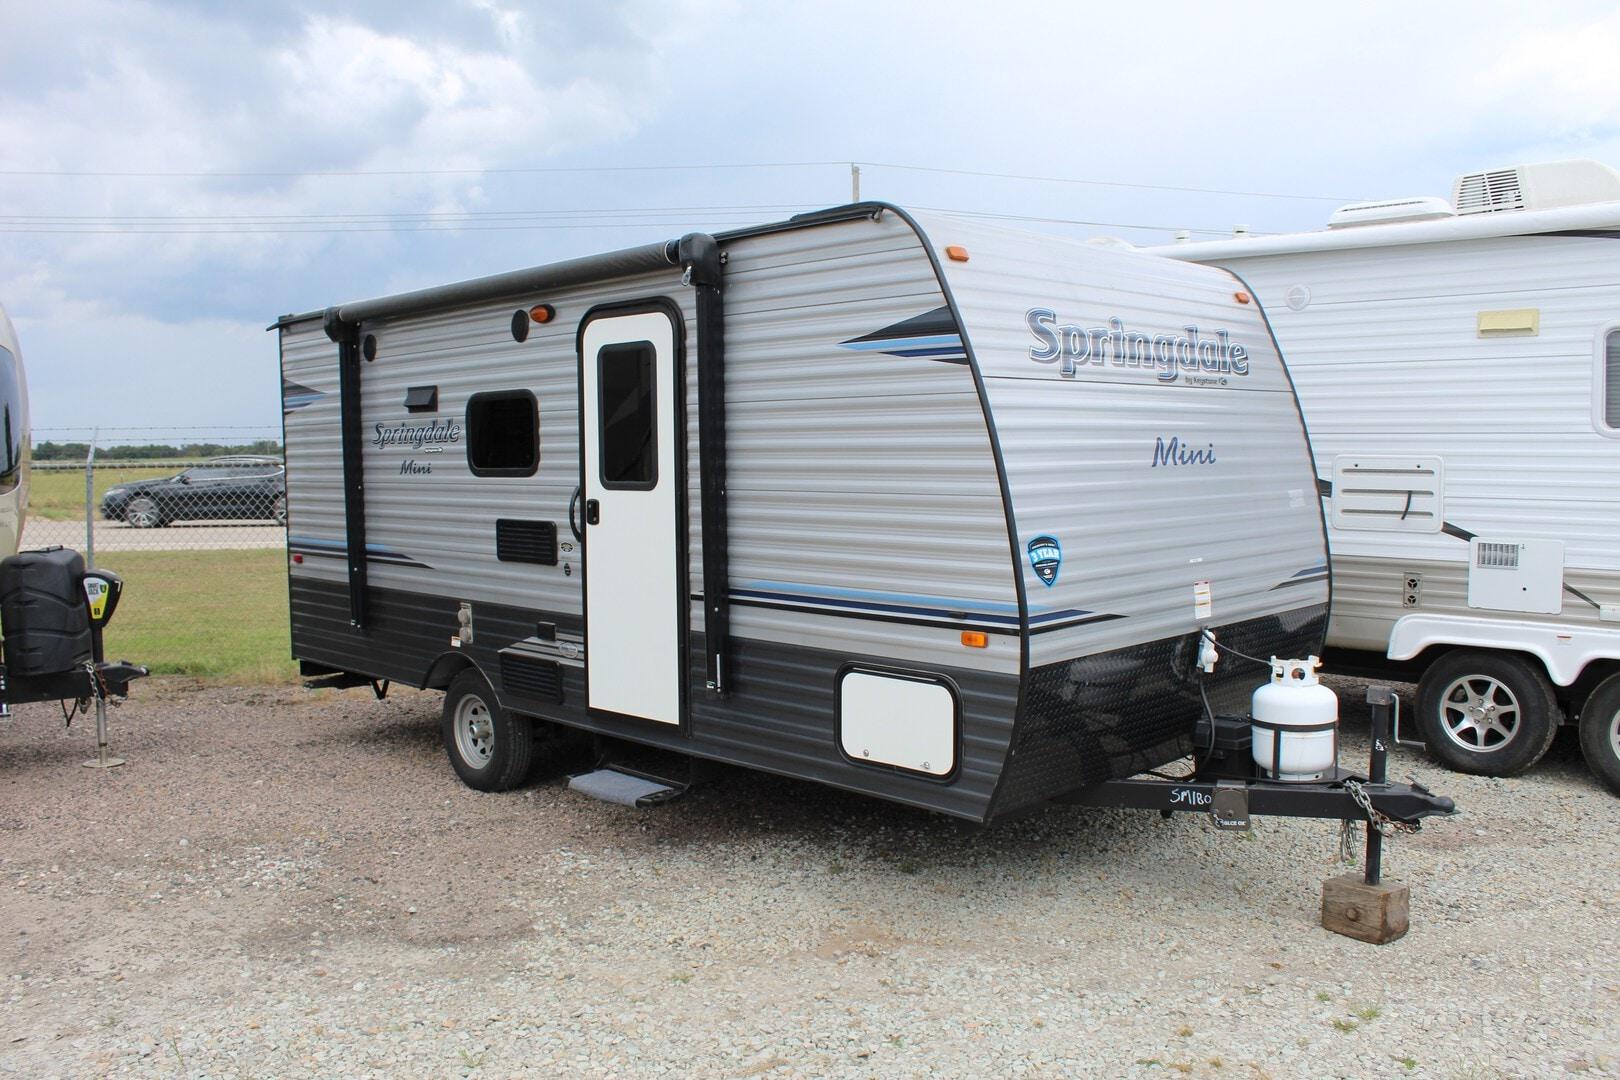 Used, 2018, Keystone, Springdale Mini 1800BH, Travel Trailers